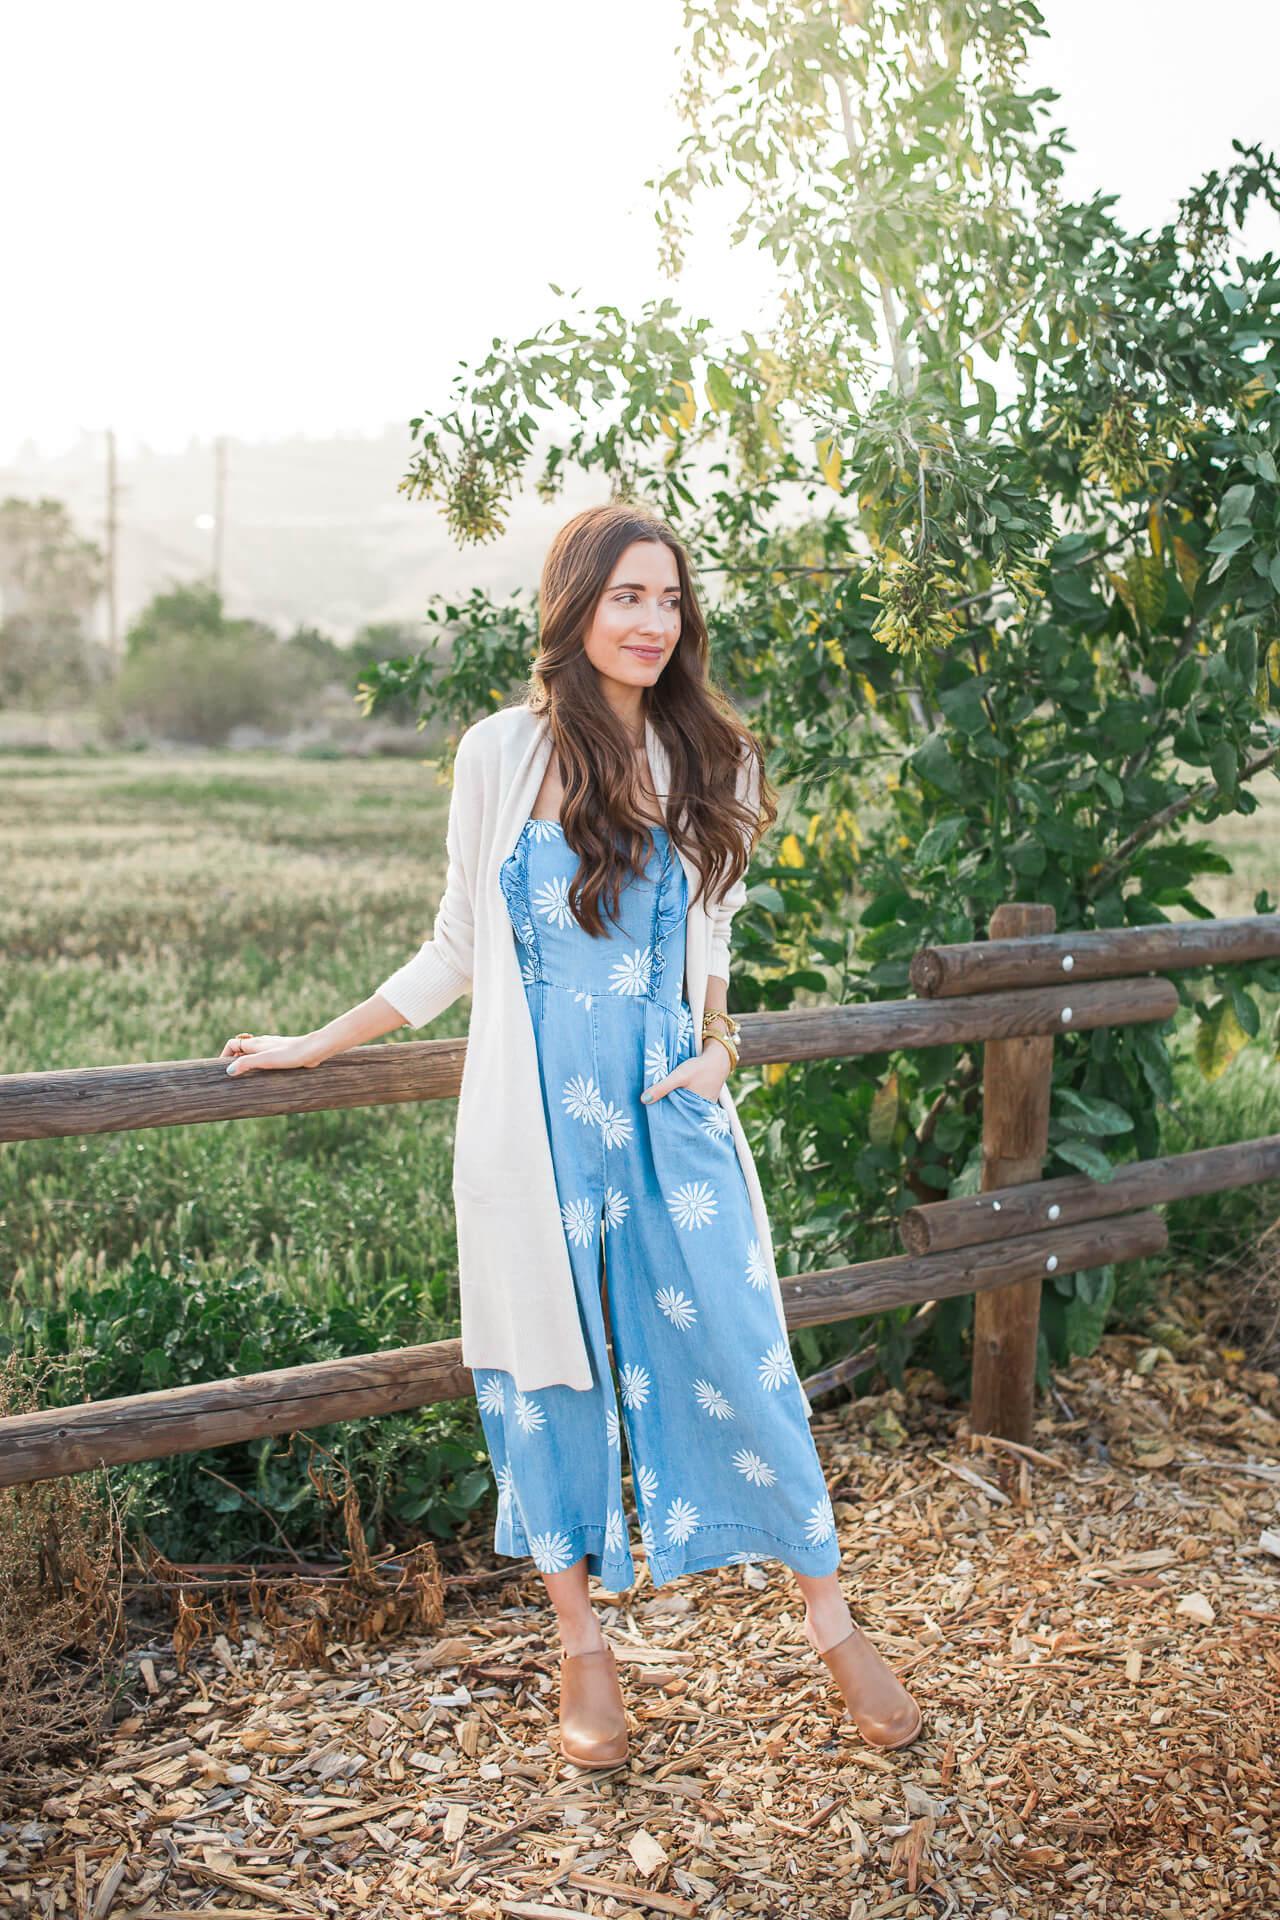 a boho feminine outfit for spring on OC fashion blogger M Loves M @marmar